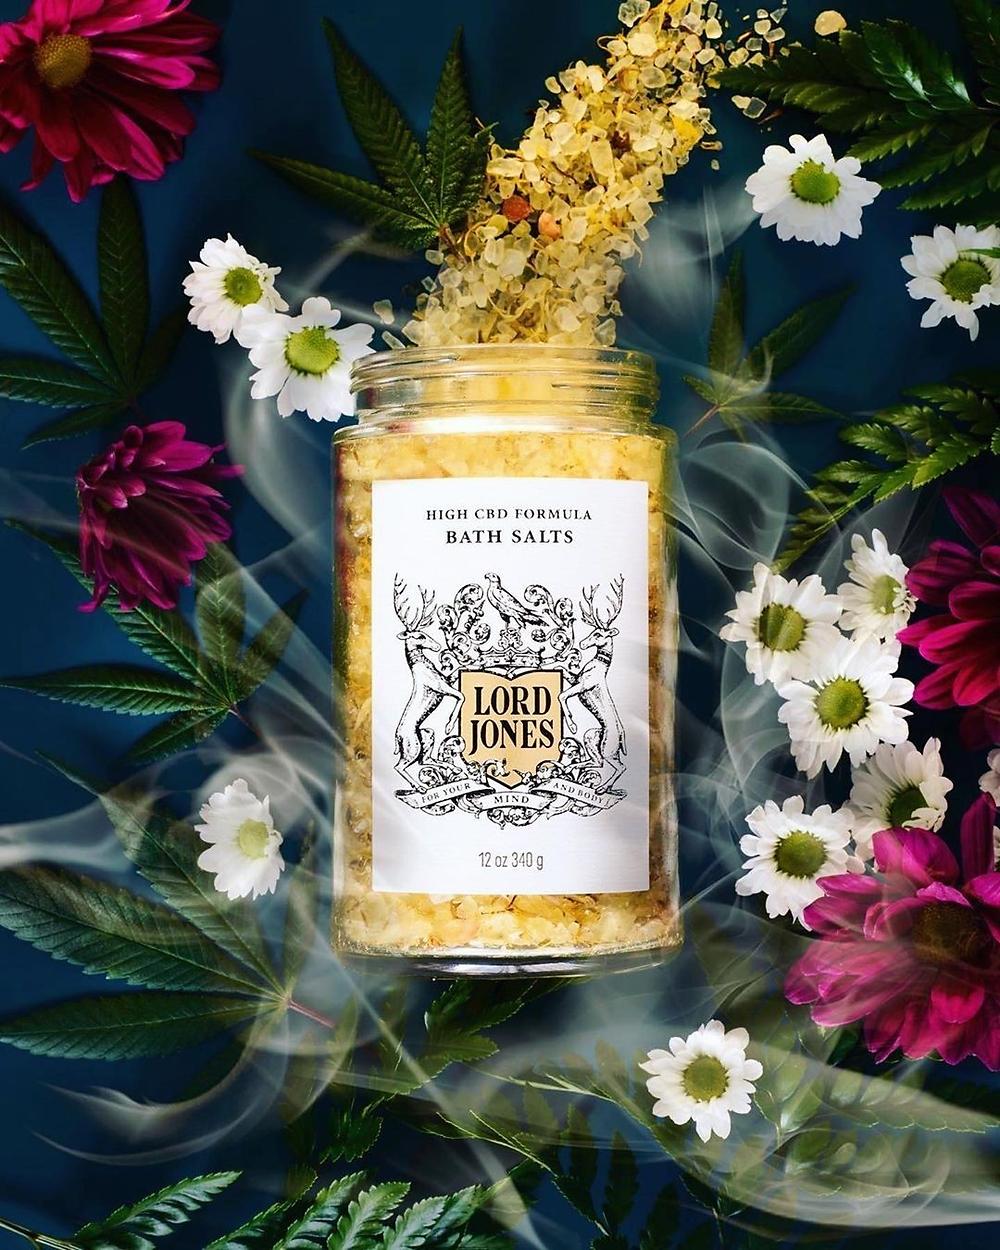 Lord Jones CBD bath salts in a background of flowers